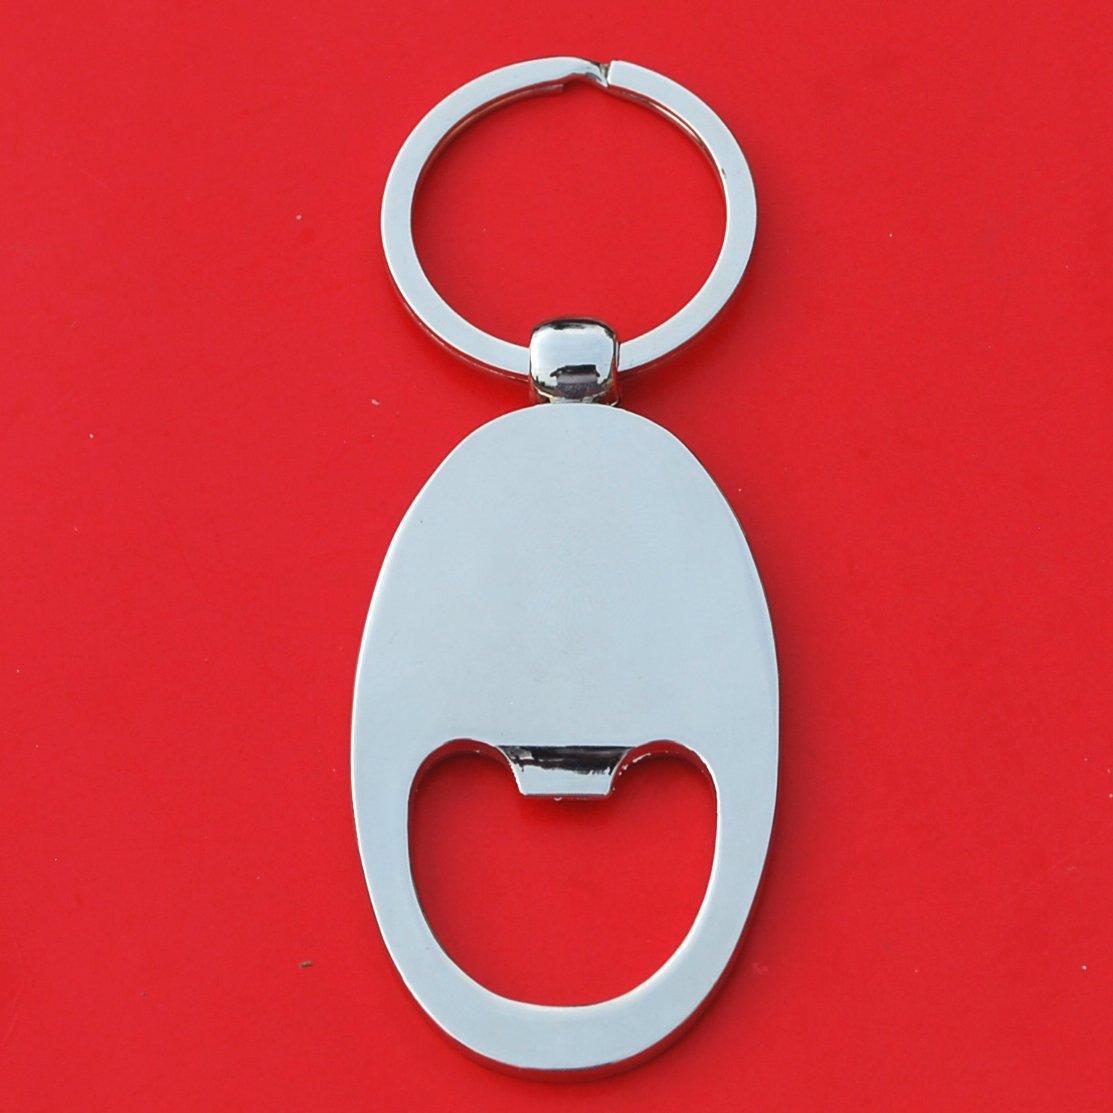 Irish Ireland 3 Pence Lucky Rabbit Hare Coin Key Chain Ring Bottle Opener NEW